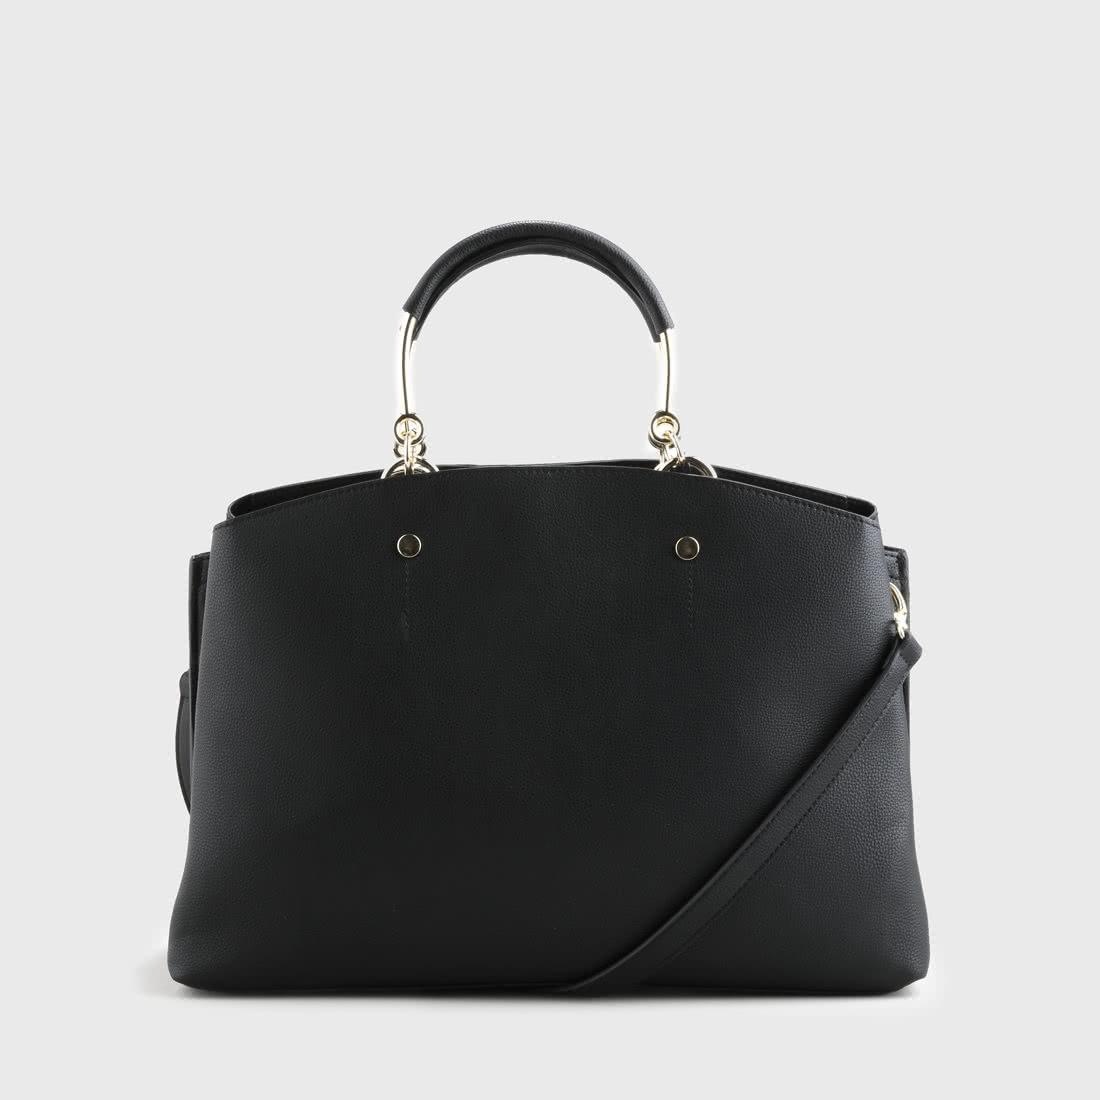 6a8b1851ef3ee Carina Handtasche Lederoptik schwarz online kaufen